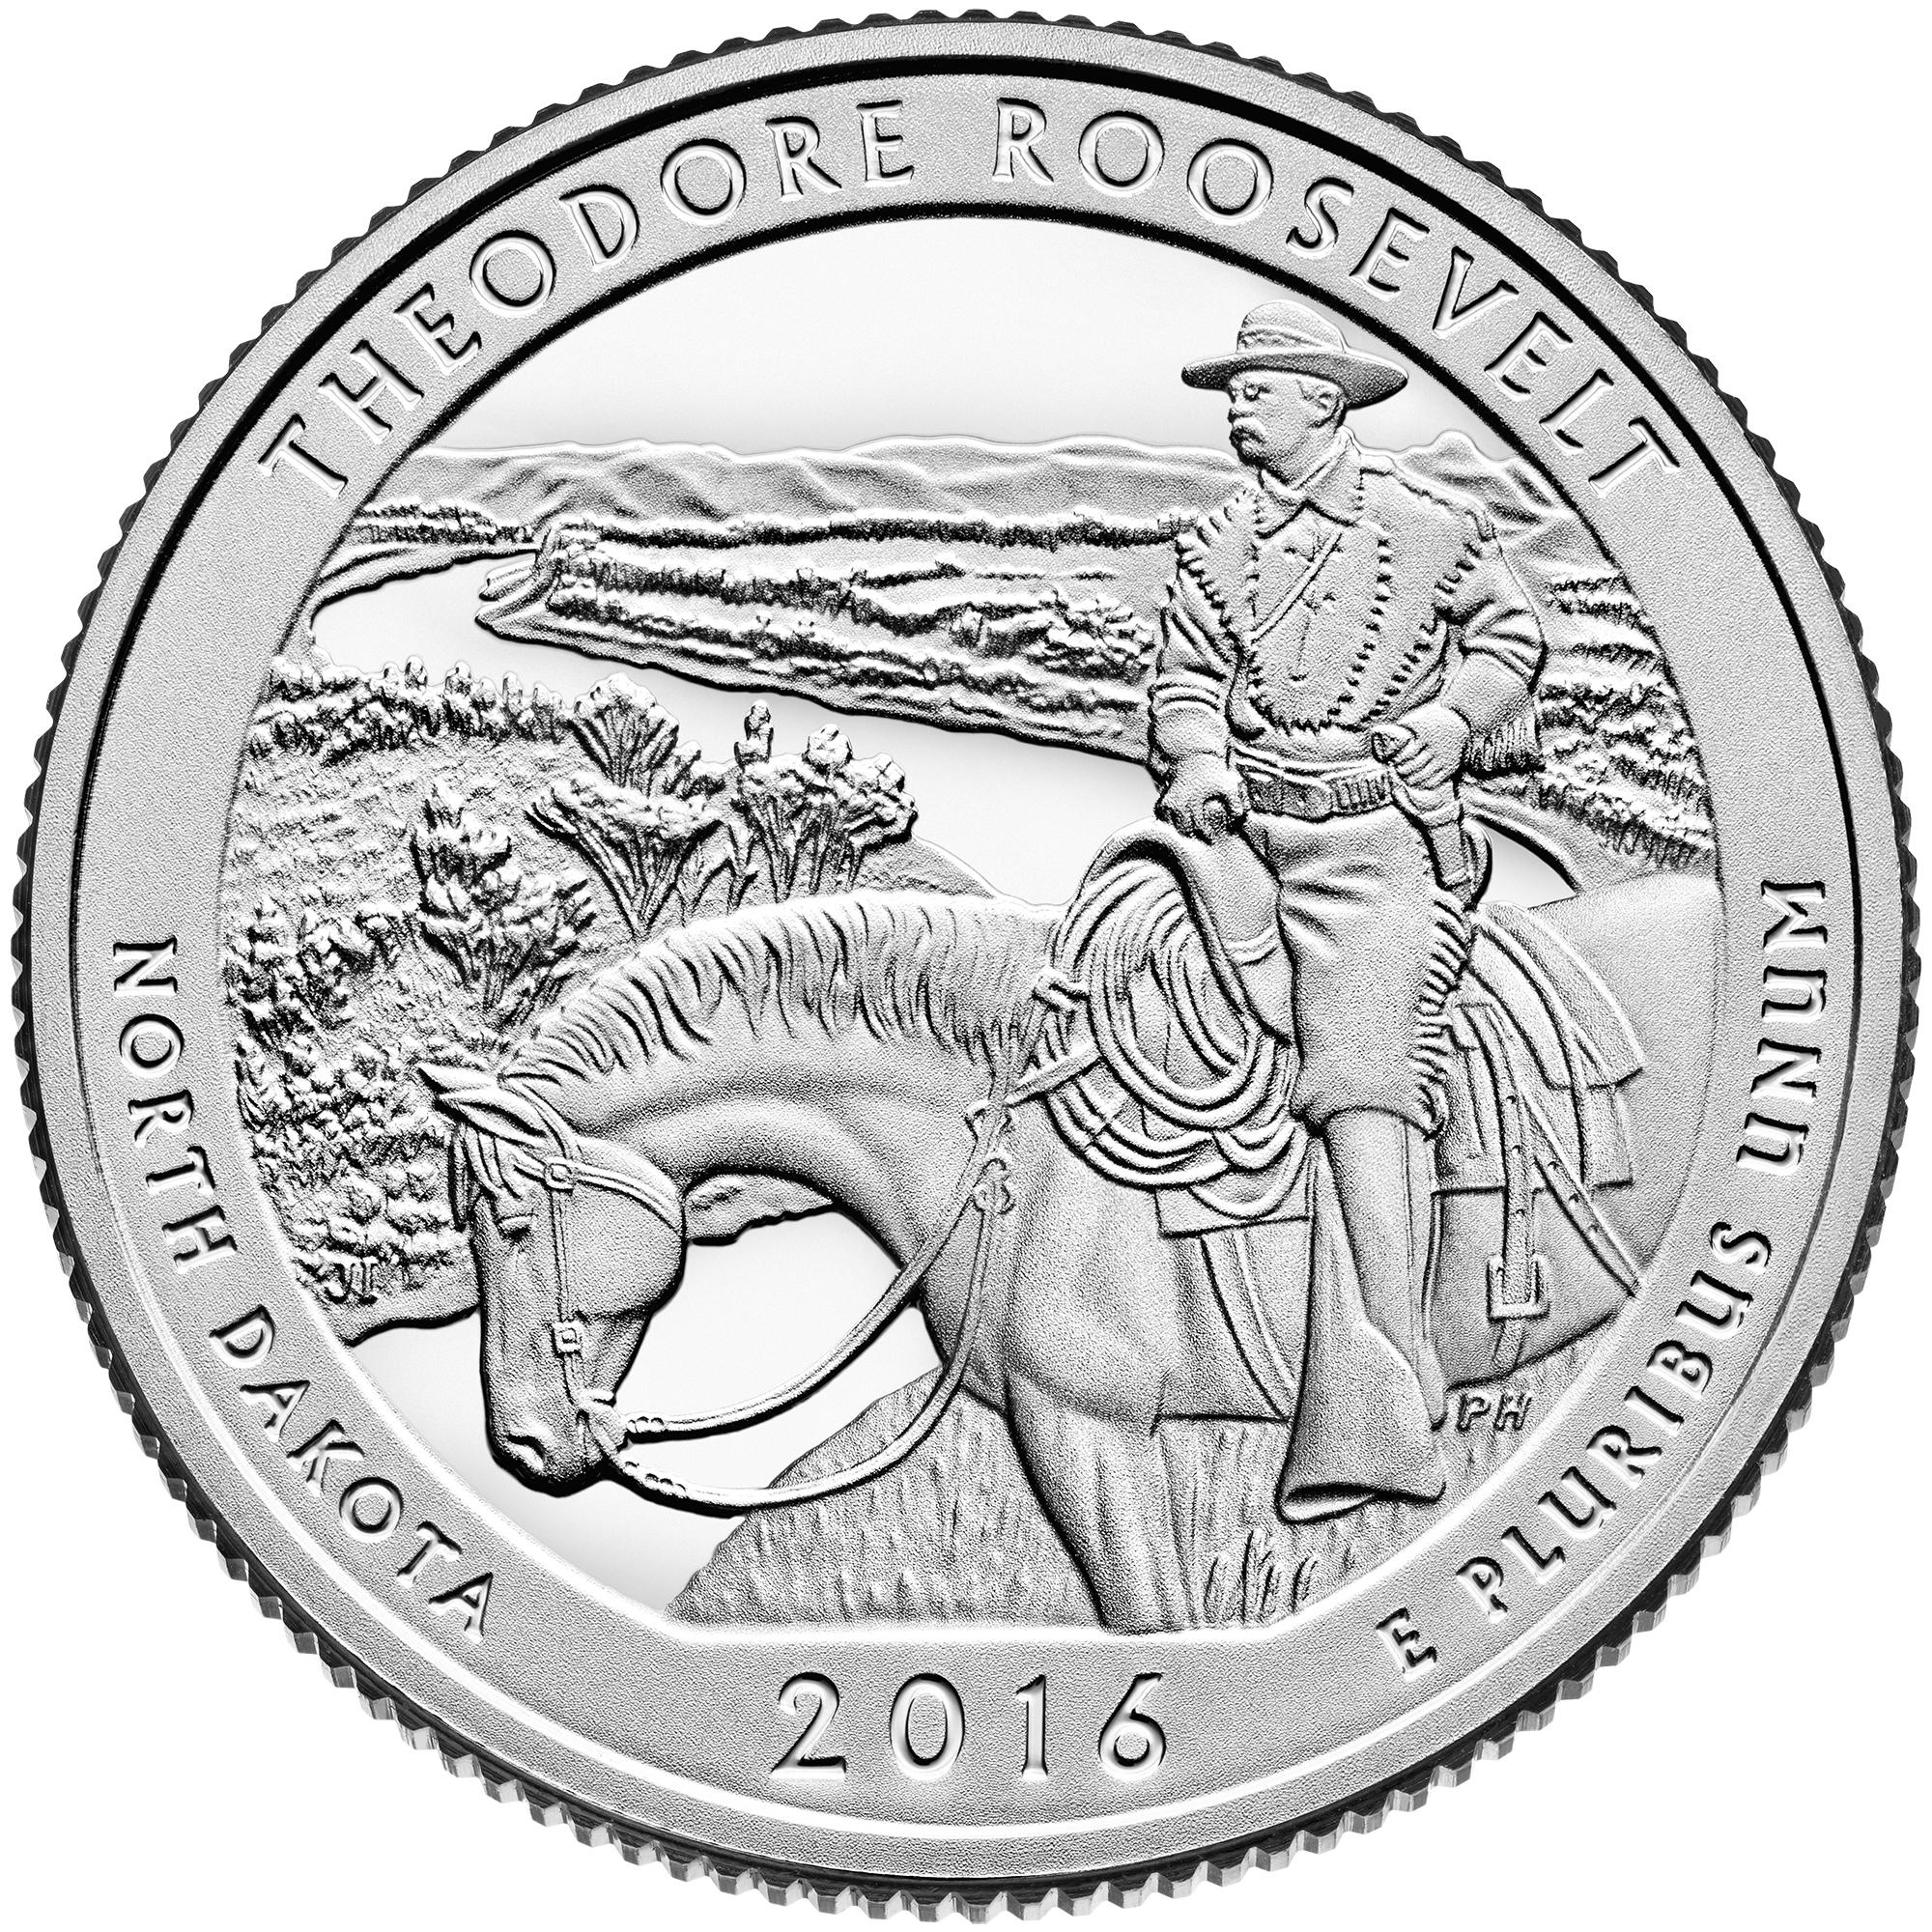 2000x2000 Silver Coins Beautiful The Coin Collector Silver John Brown S